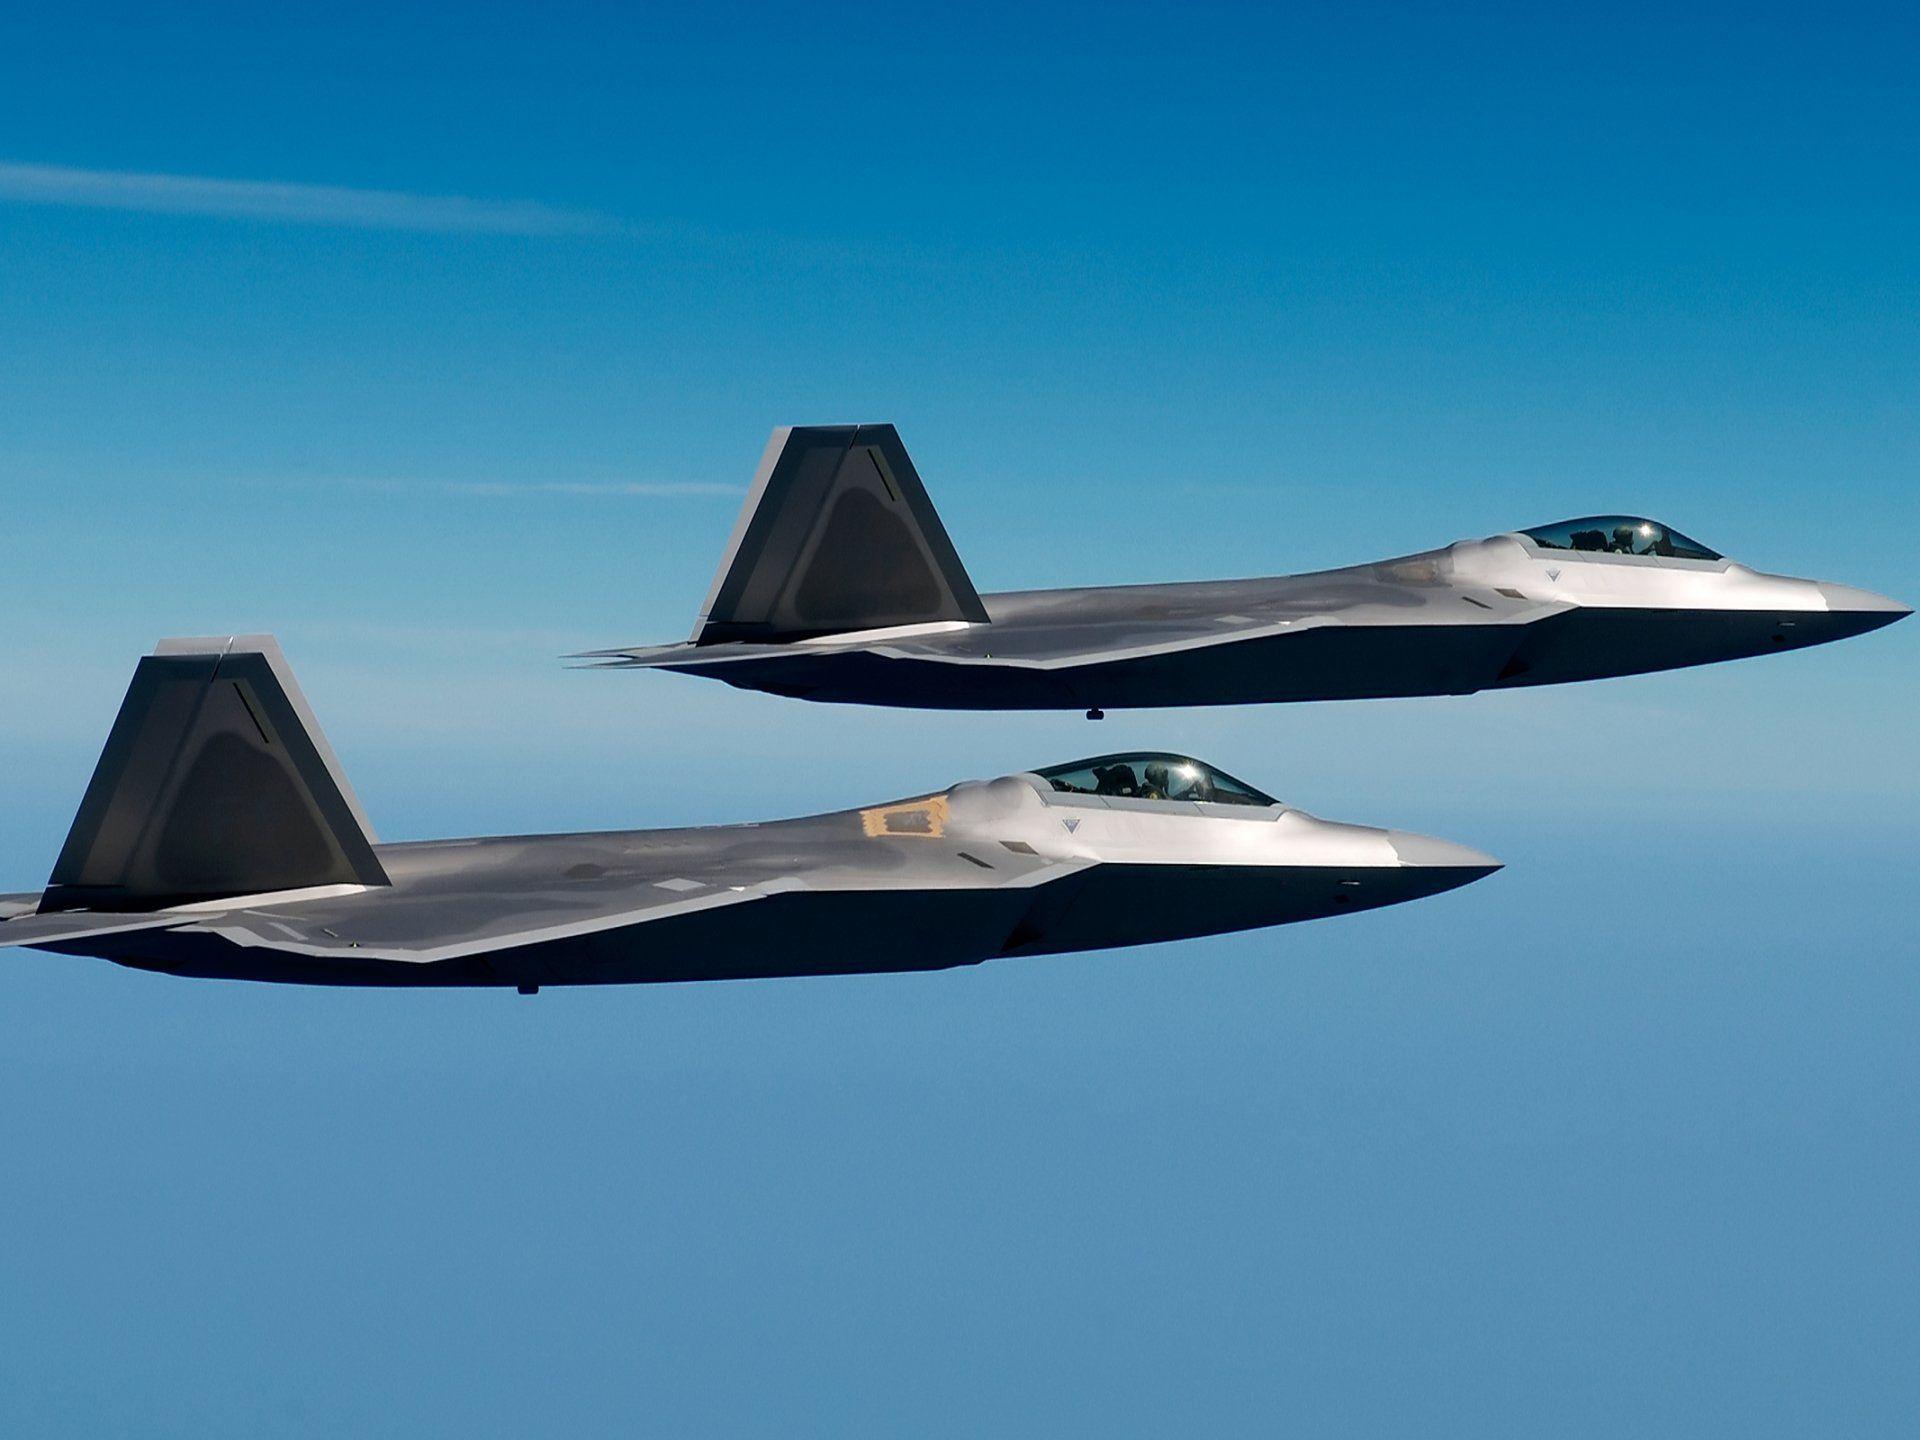 Military Lockheed Martin F 22 Raptor Wallpaper Air Force Wallpaper Military Aircraft Us Military Aircraft